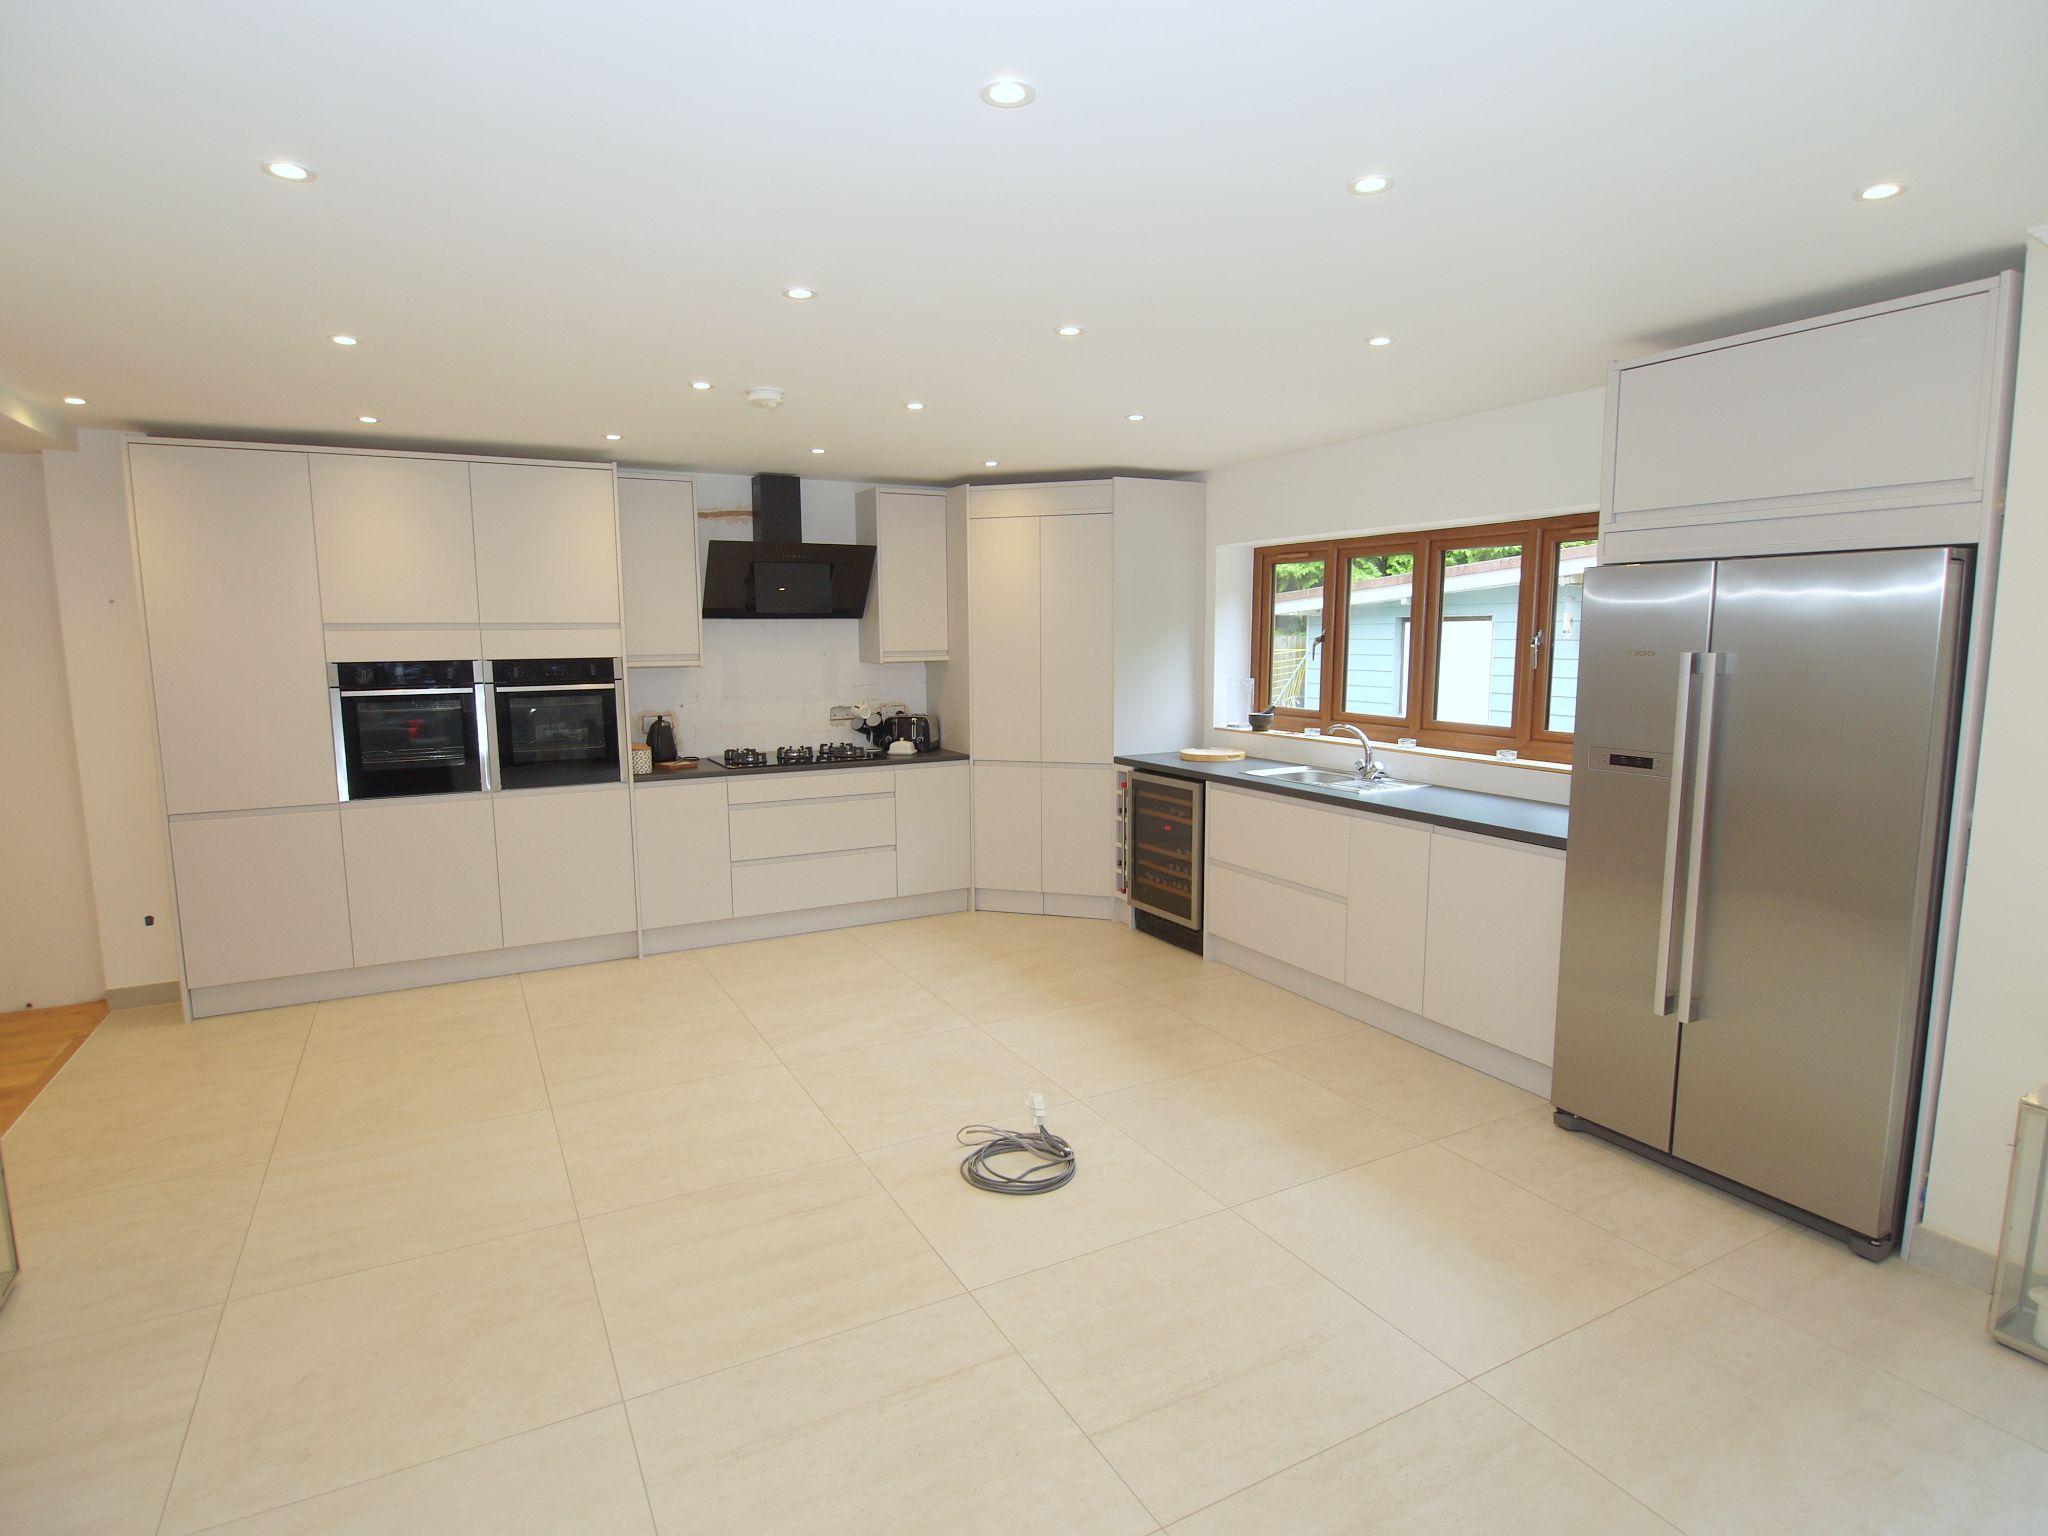 5 bedroom detached house Sold in Sevenoaks - Photograph 5